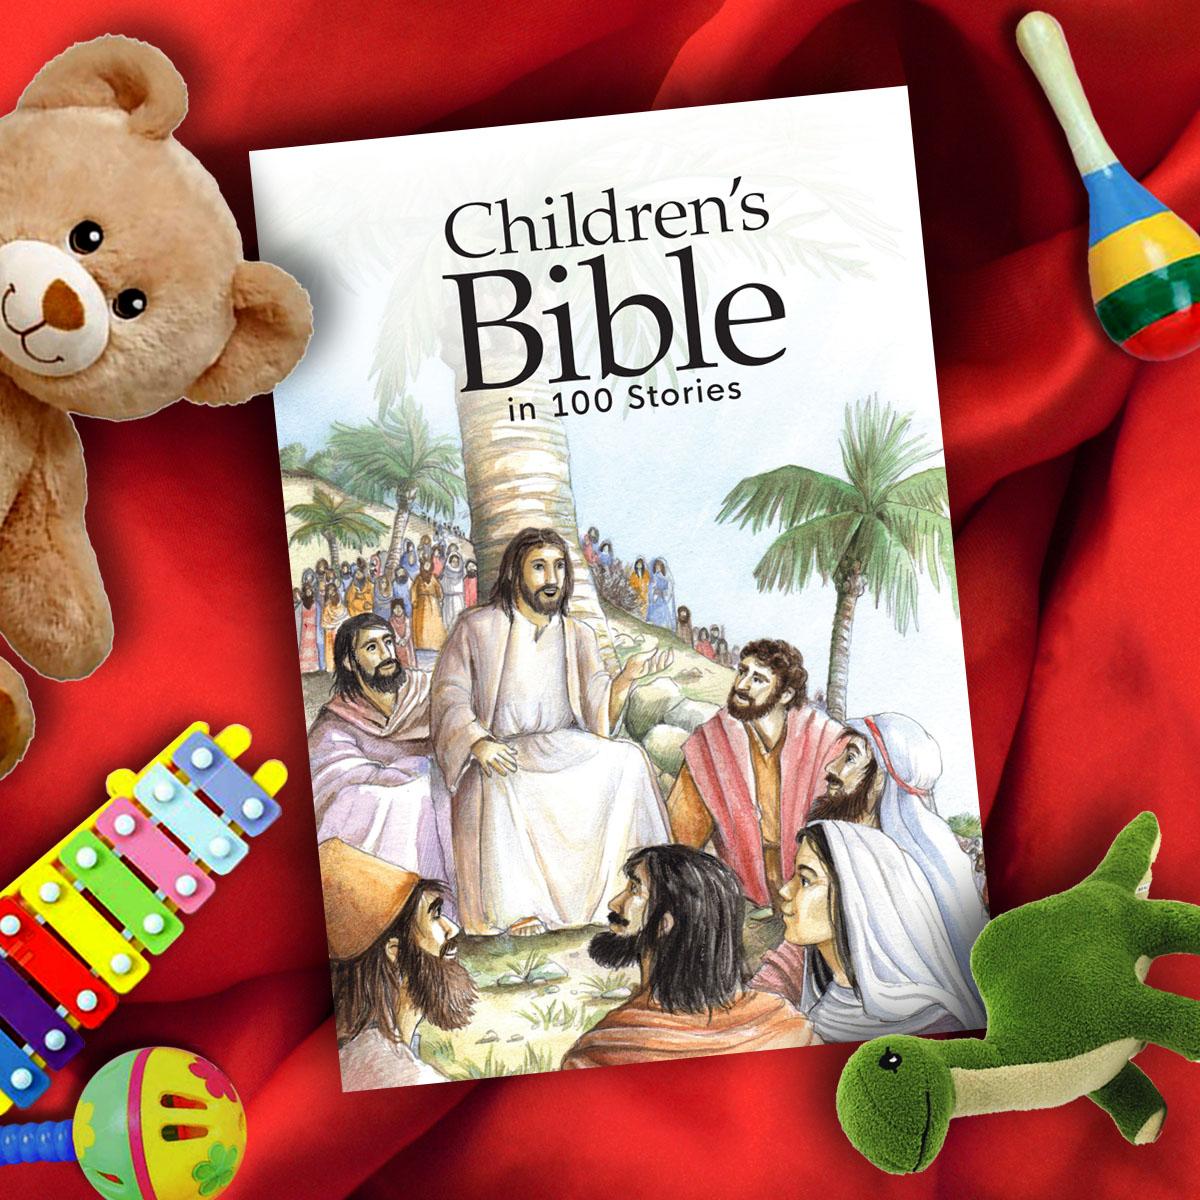 Childrens Bible.jpg